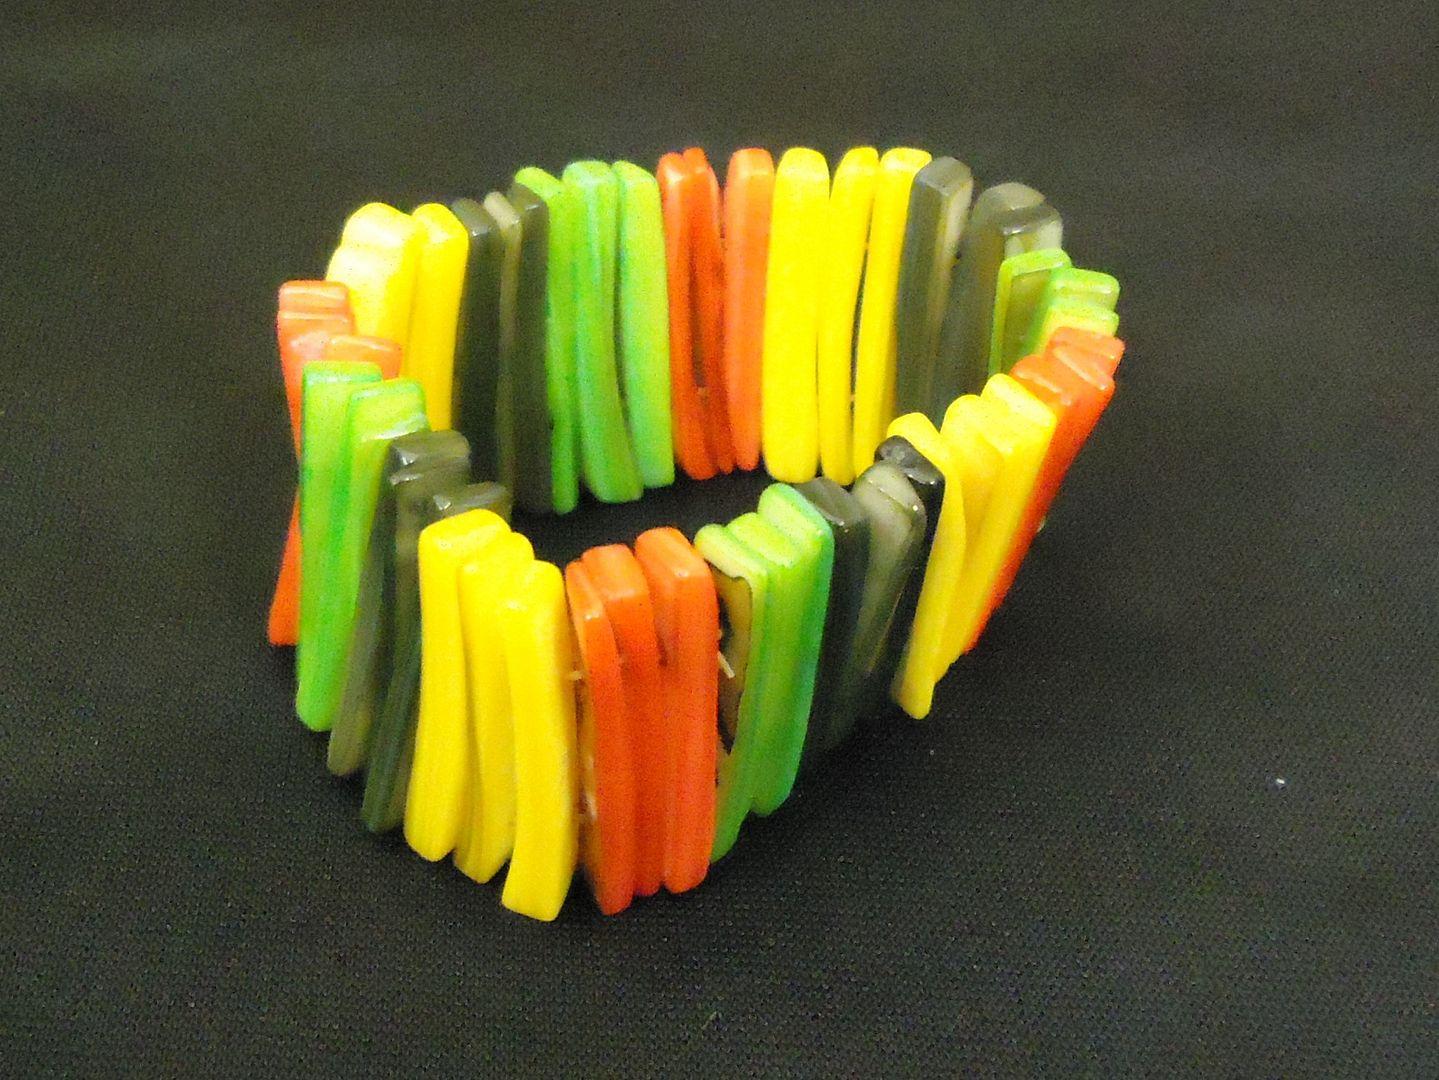 lm7410 112712-570n Designer Fashion Bracelet Starnd/String Plastic Female Adult Yellow/Green/Red